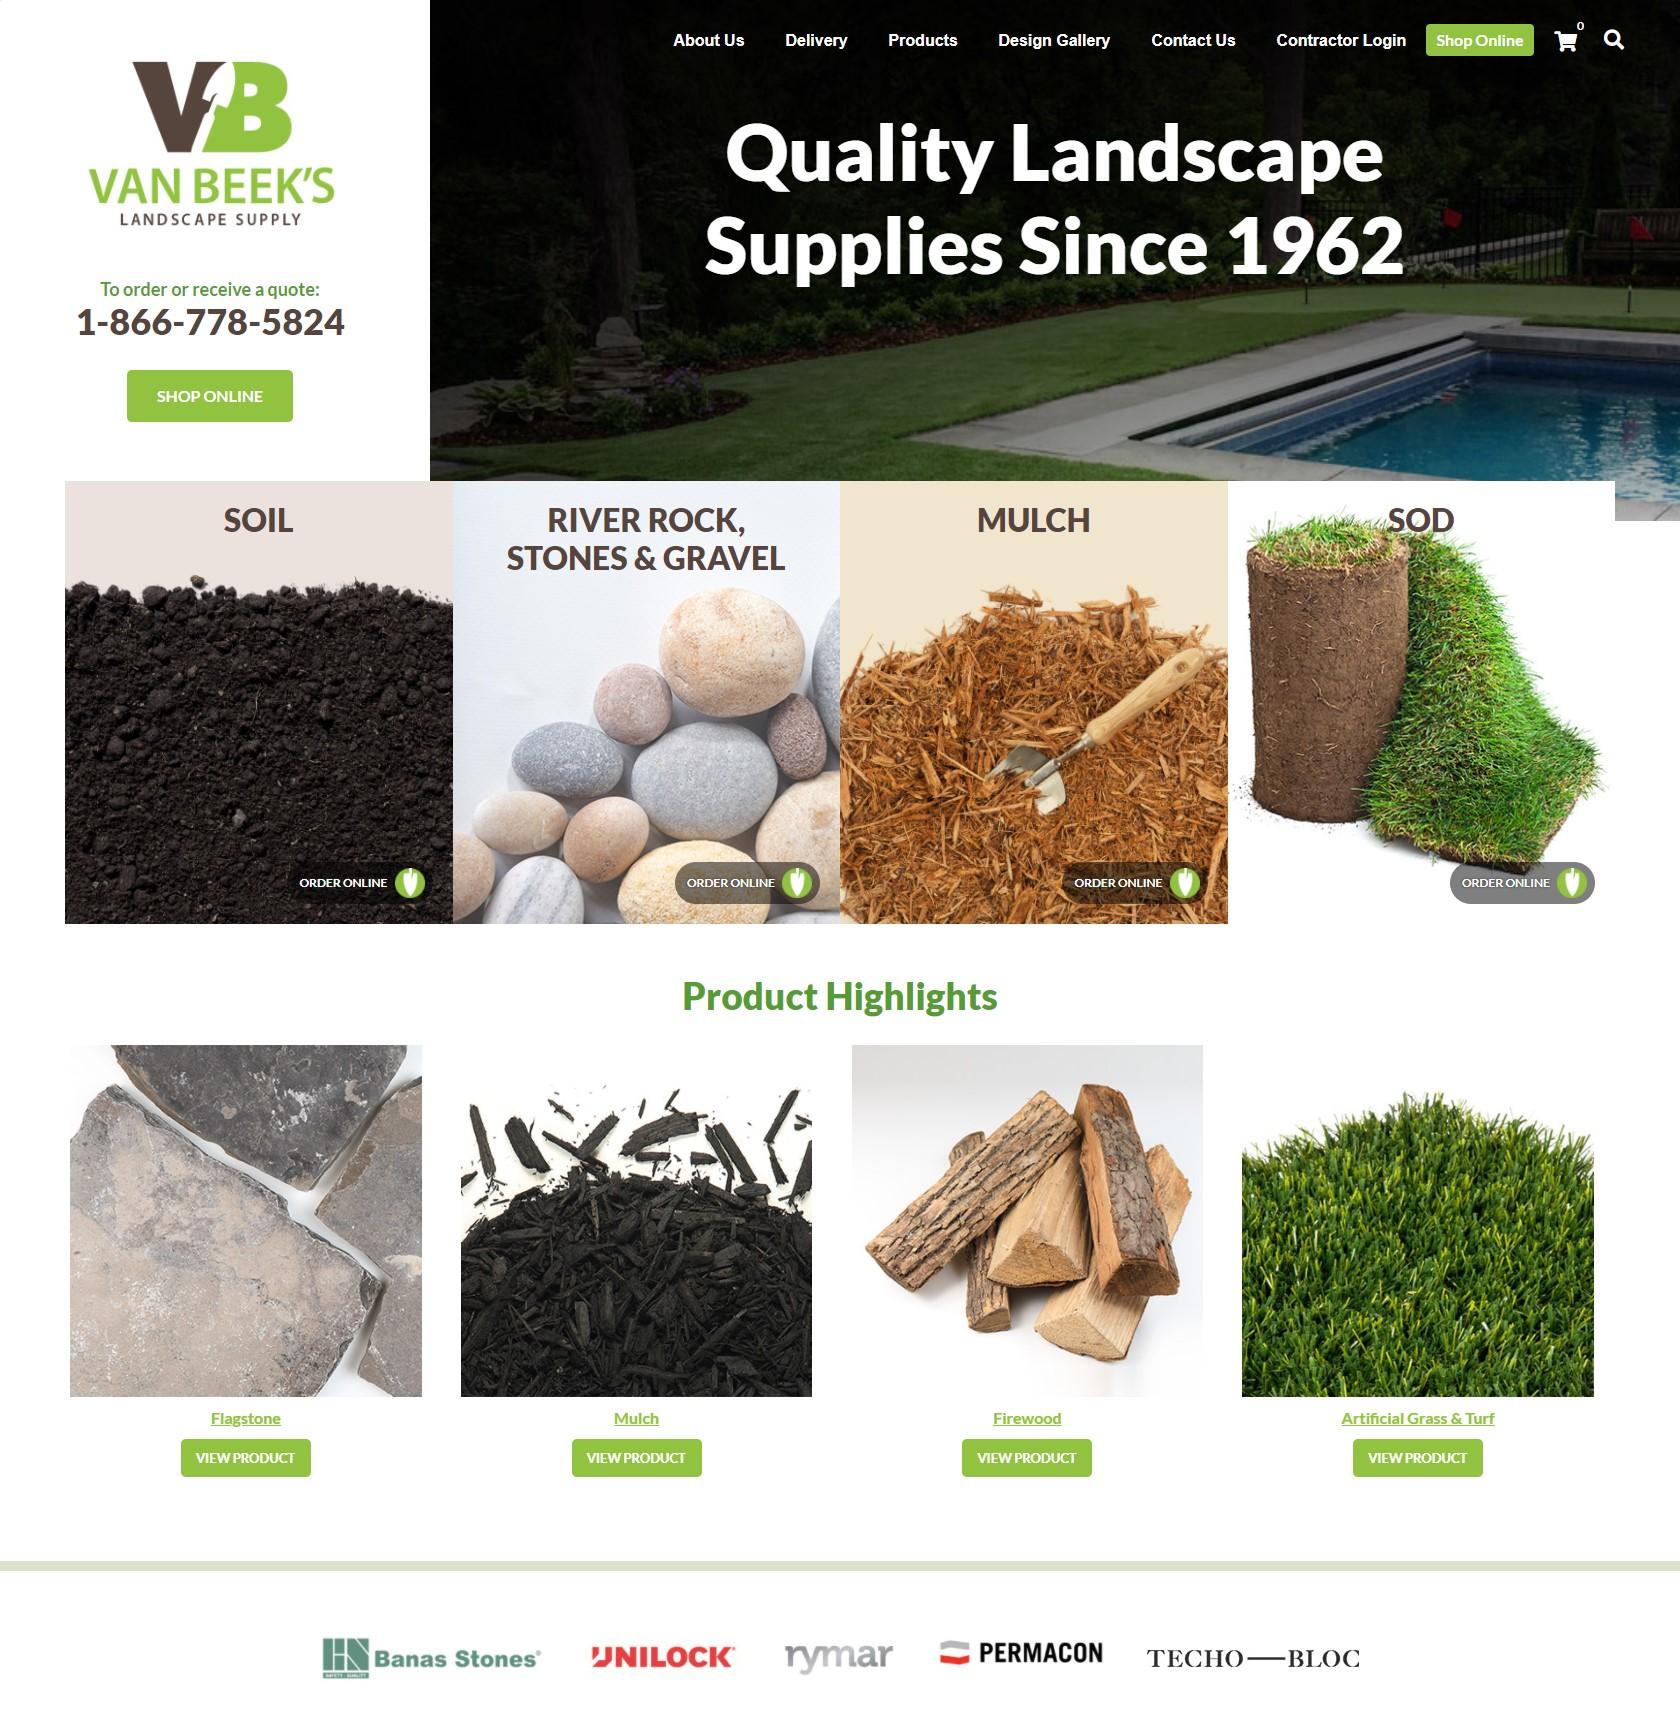 Van Beek's Landscaping Supply image